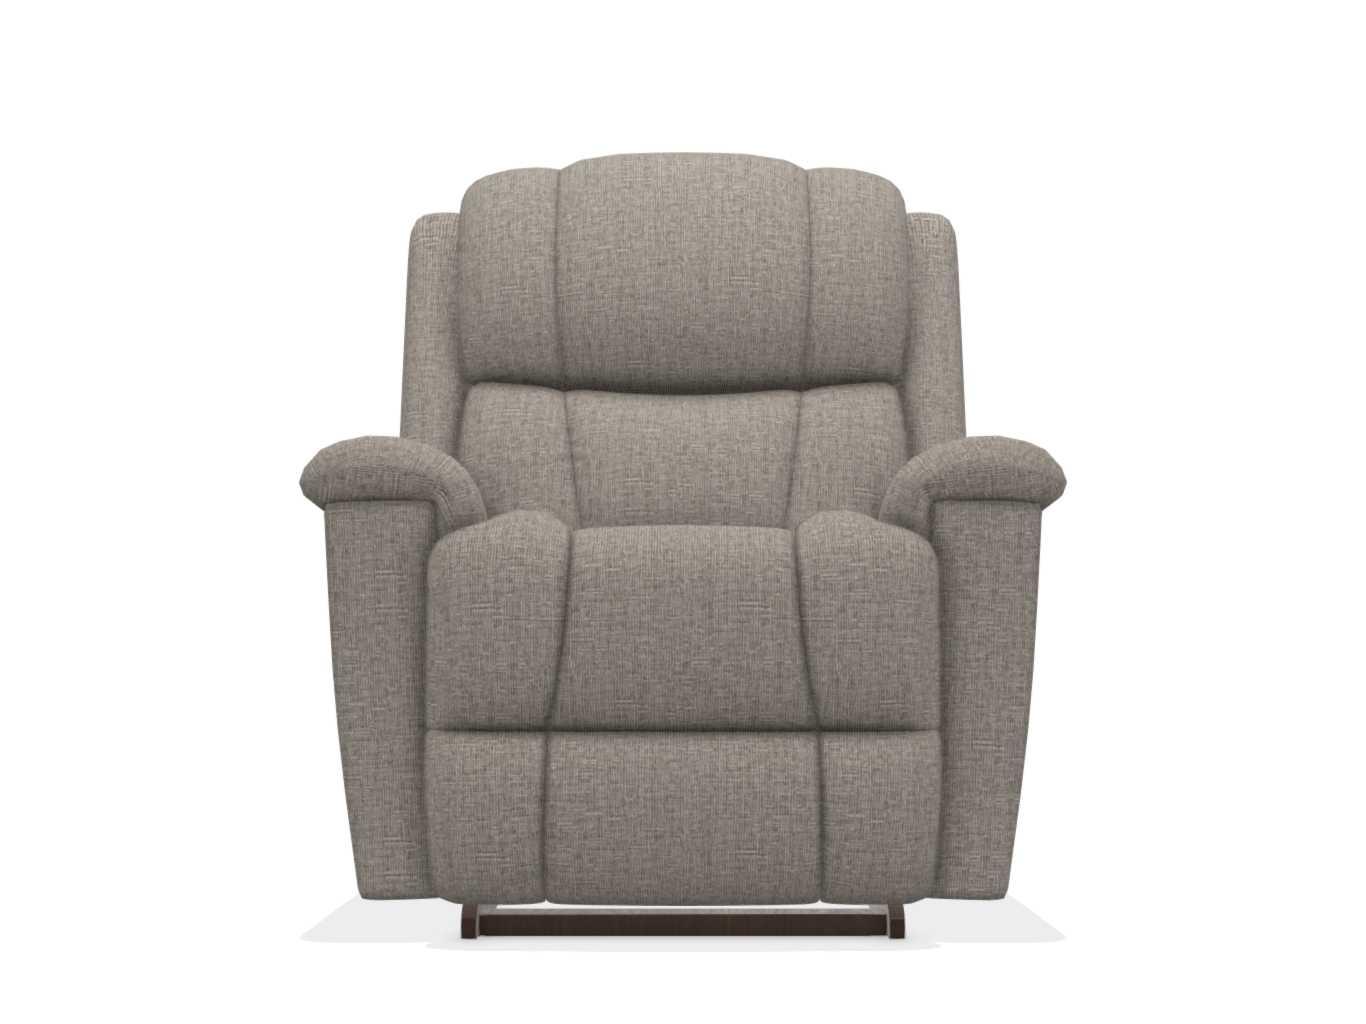 Stratus Power Rocking Recliner w/ Headrest and Lumber